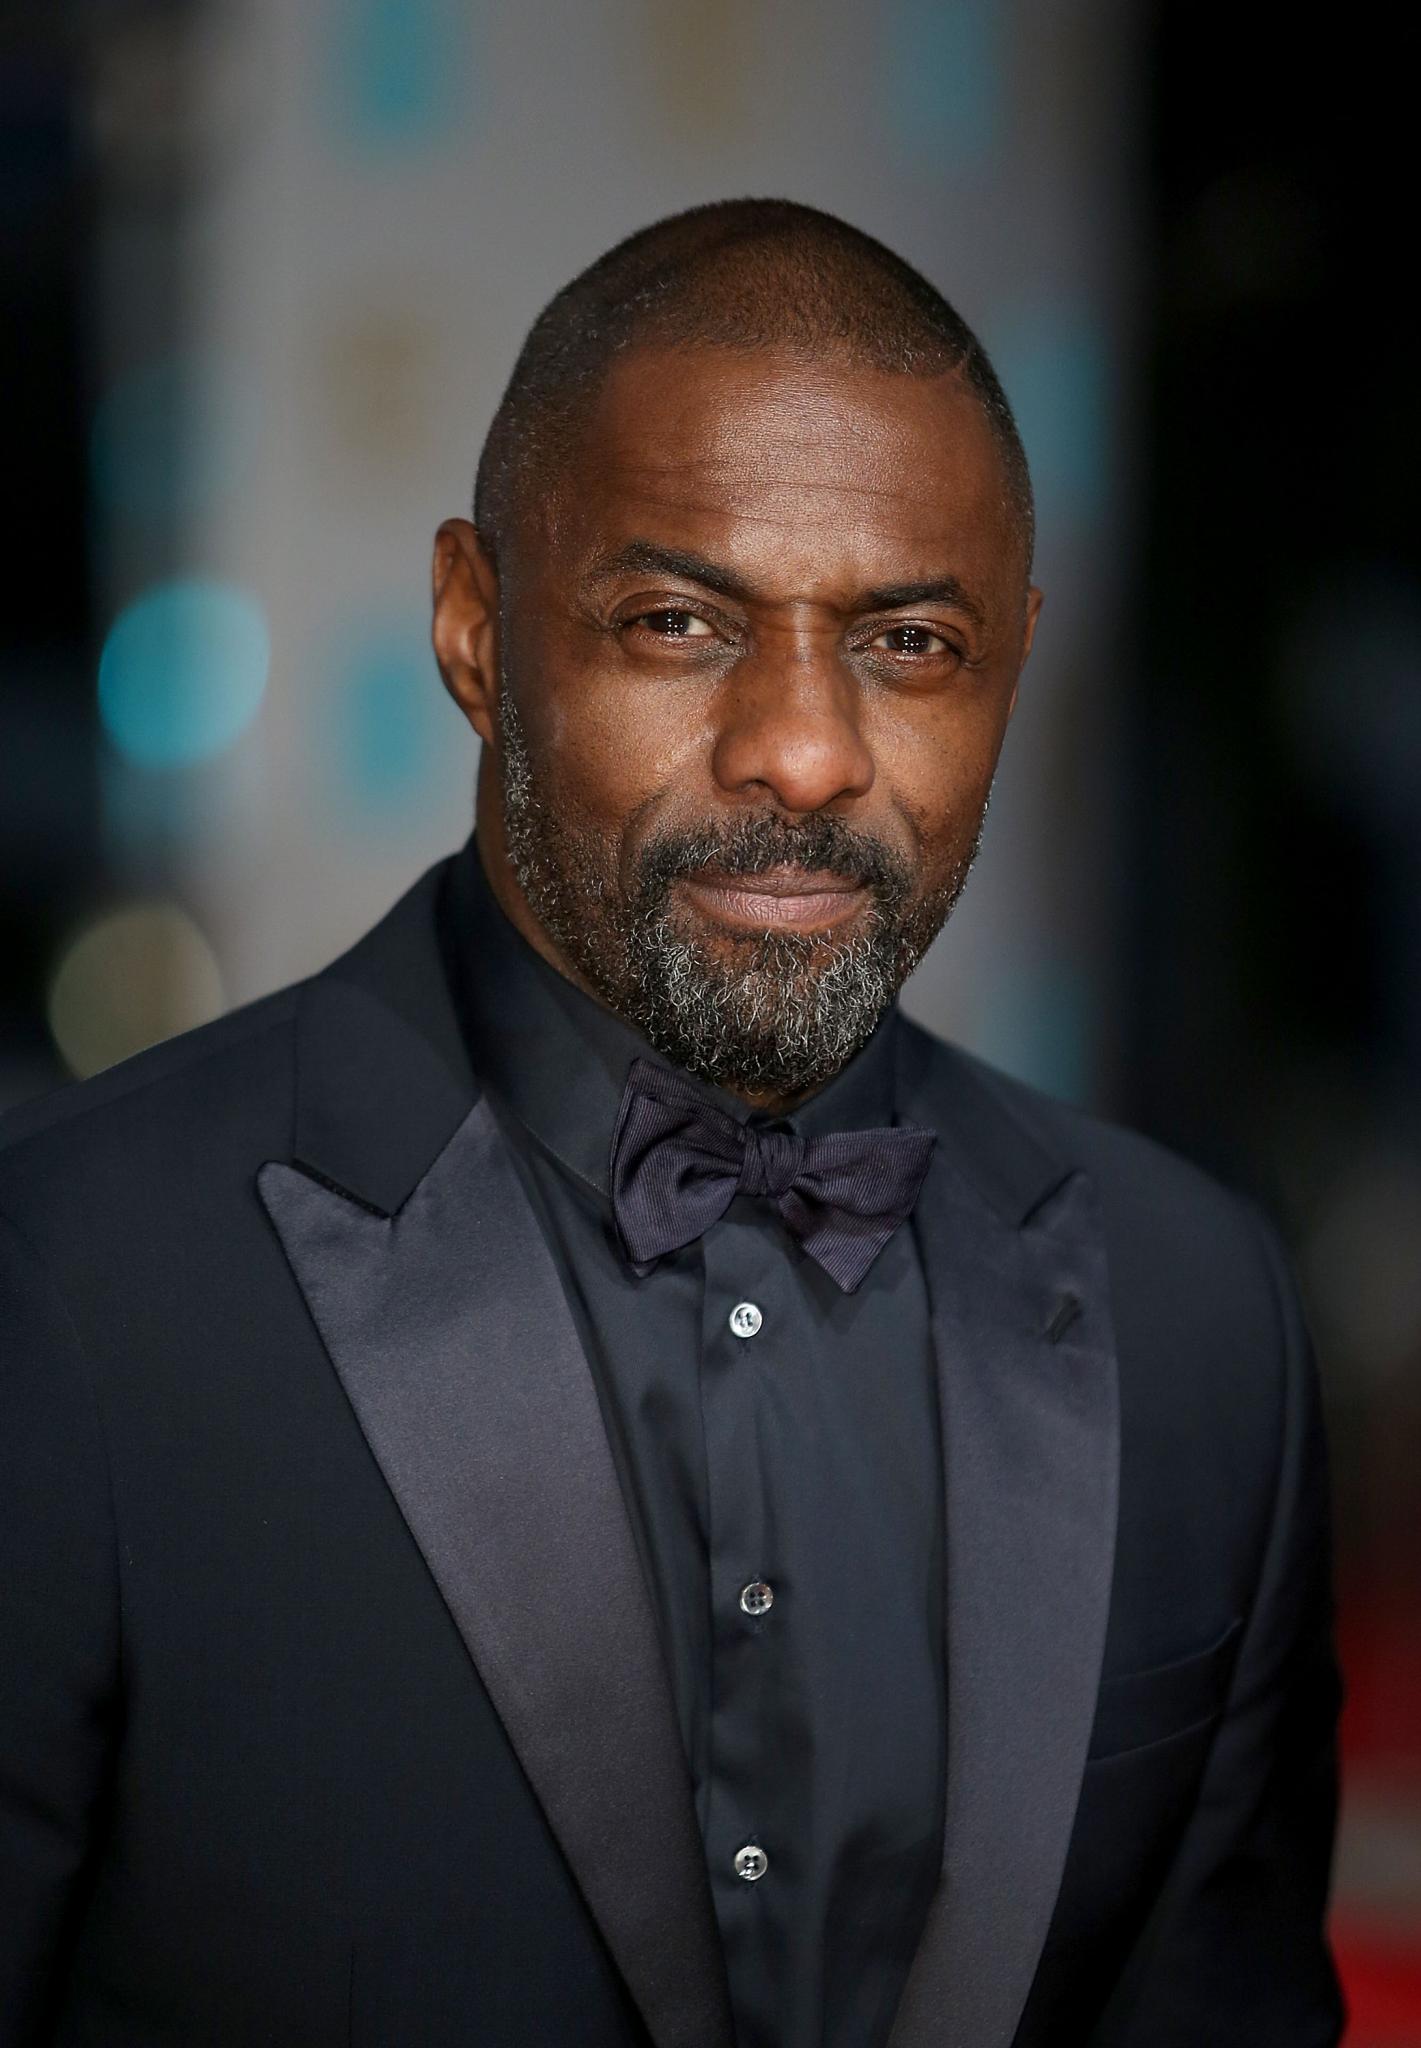 Will Idris Elba Ever Play James Bond?